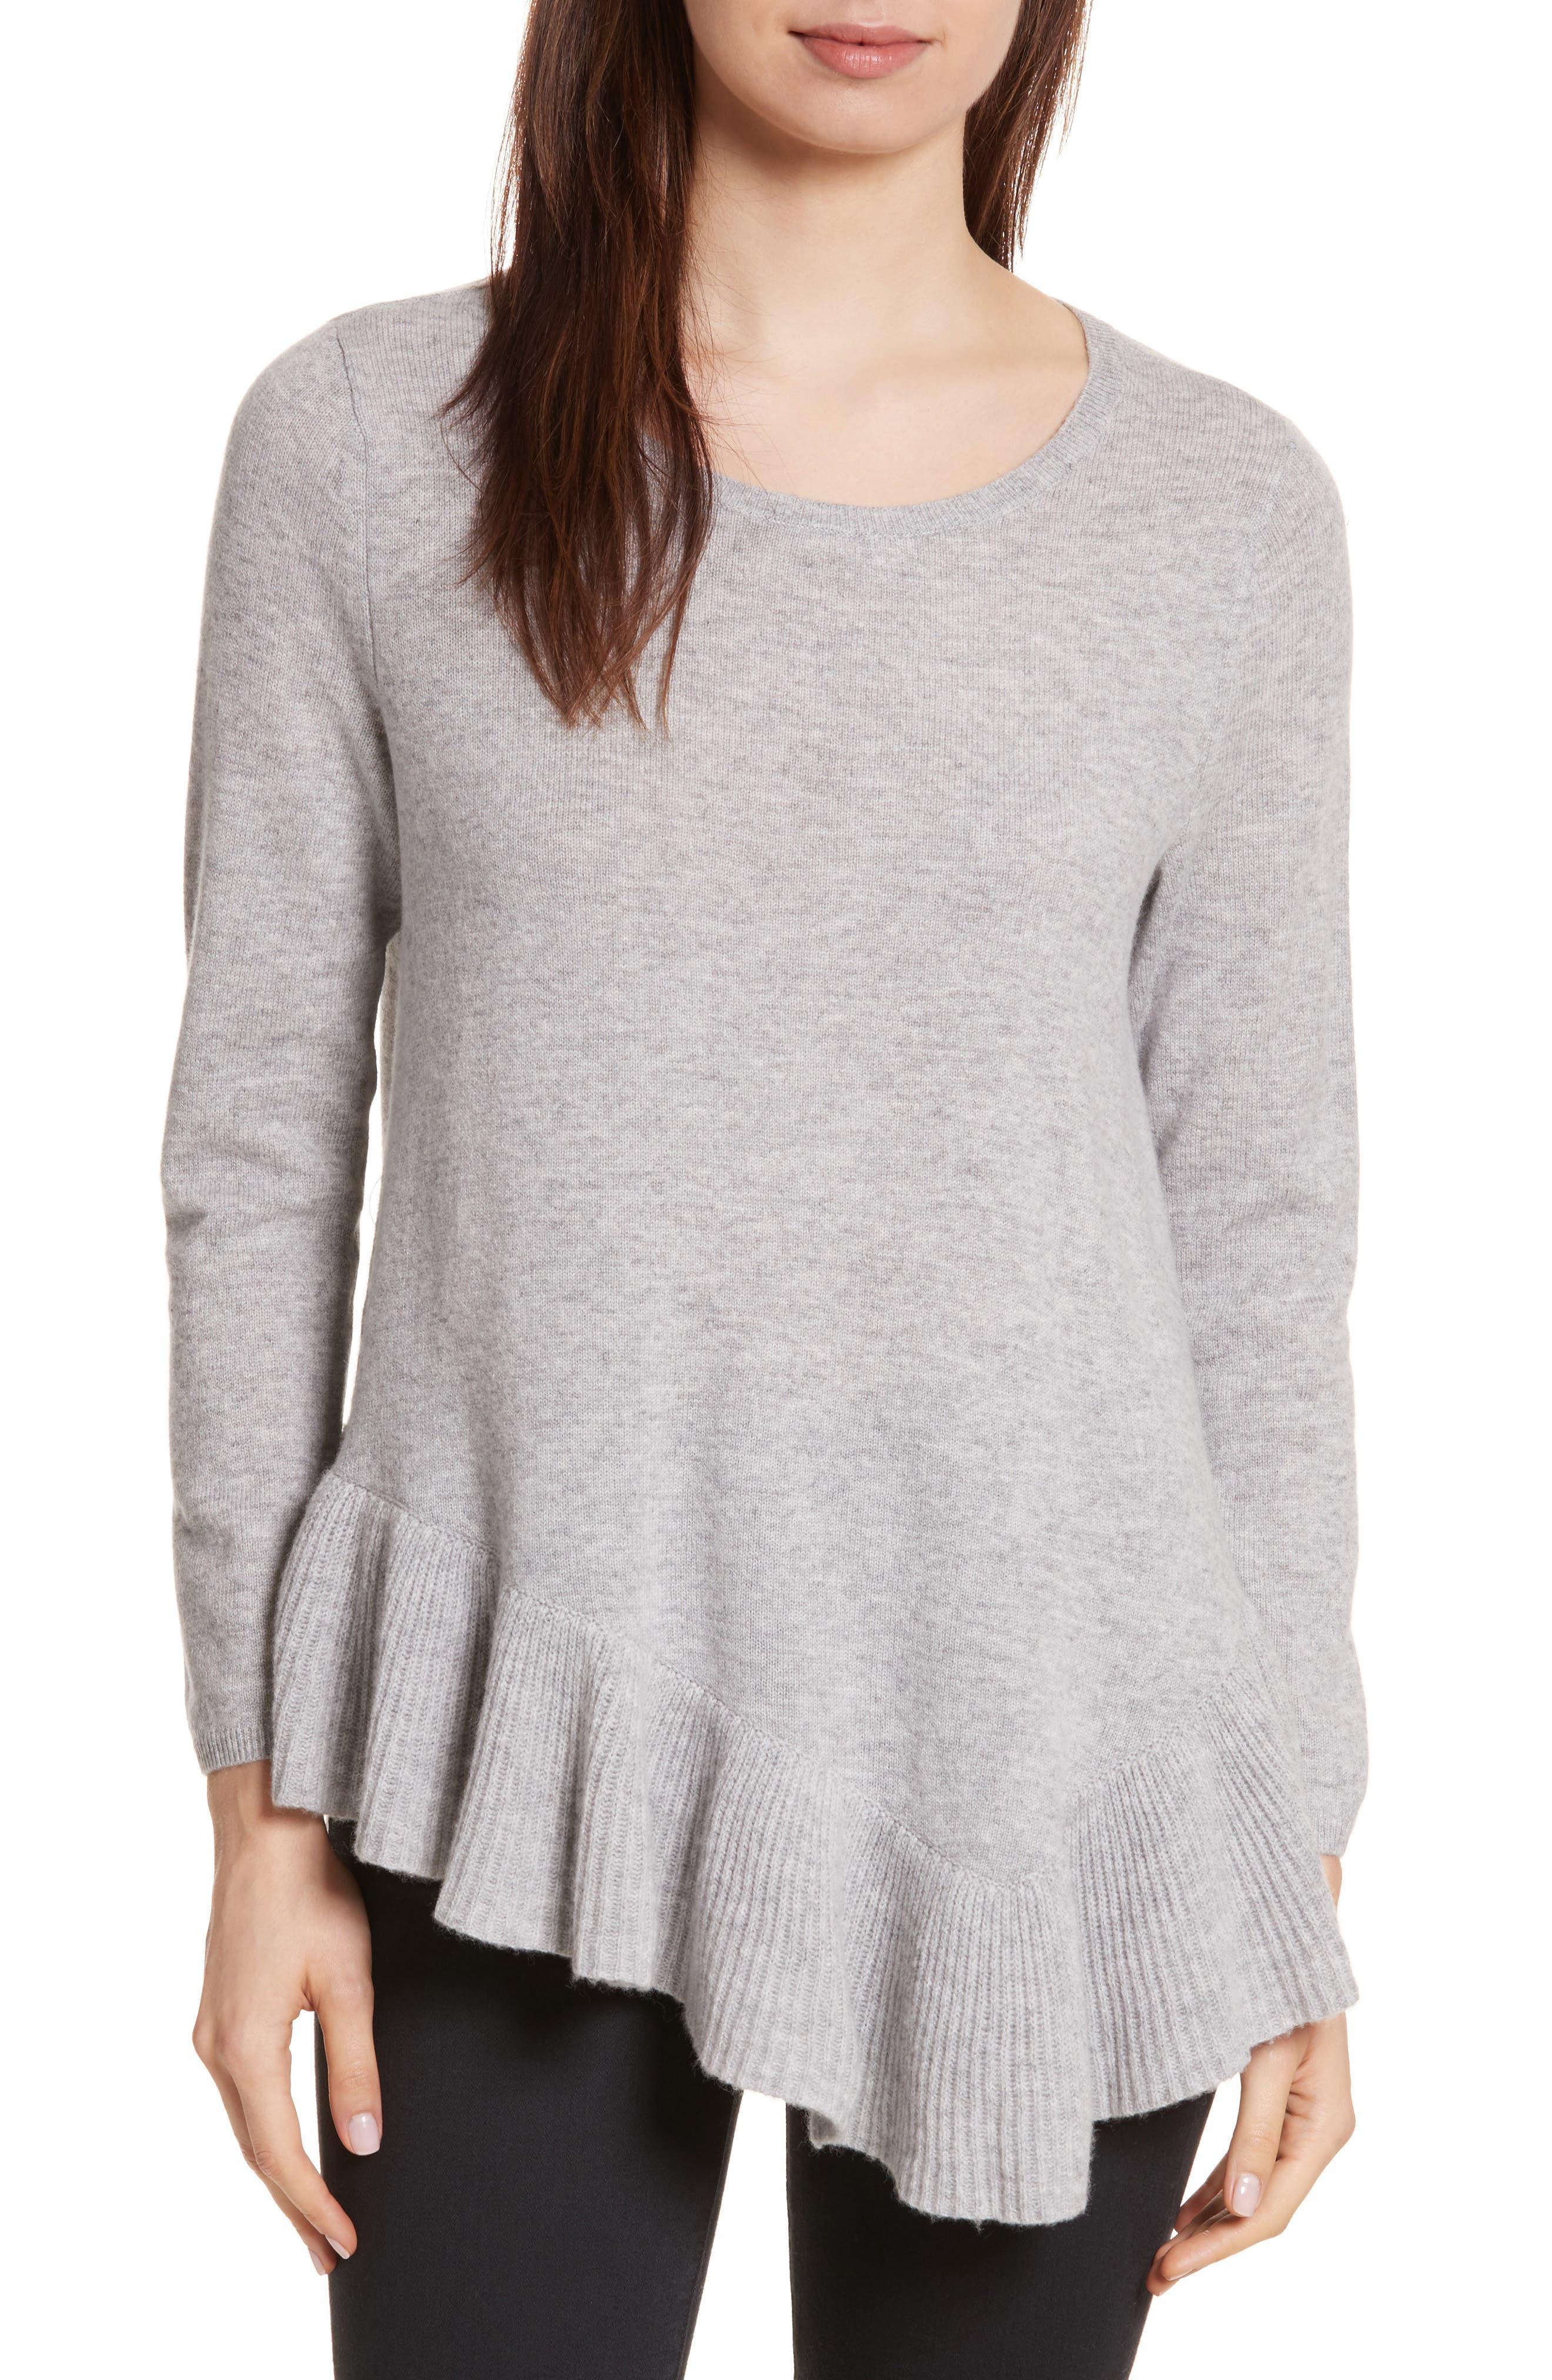 Tambrel N Wool & Cashmere Asymmetrical Sweater Tunic,                             Main thumbnail 1, color,                             Ash Heather Grey